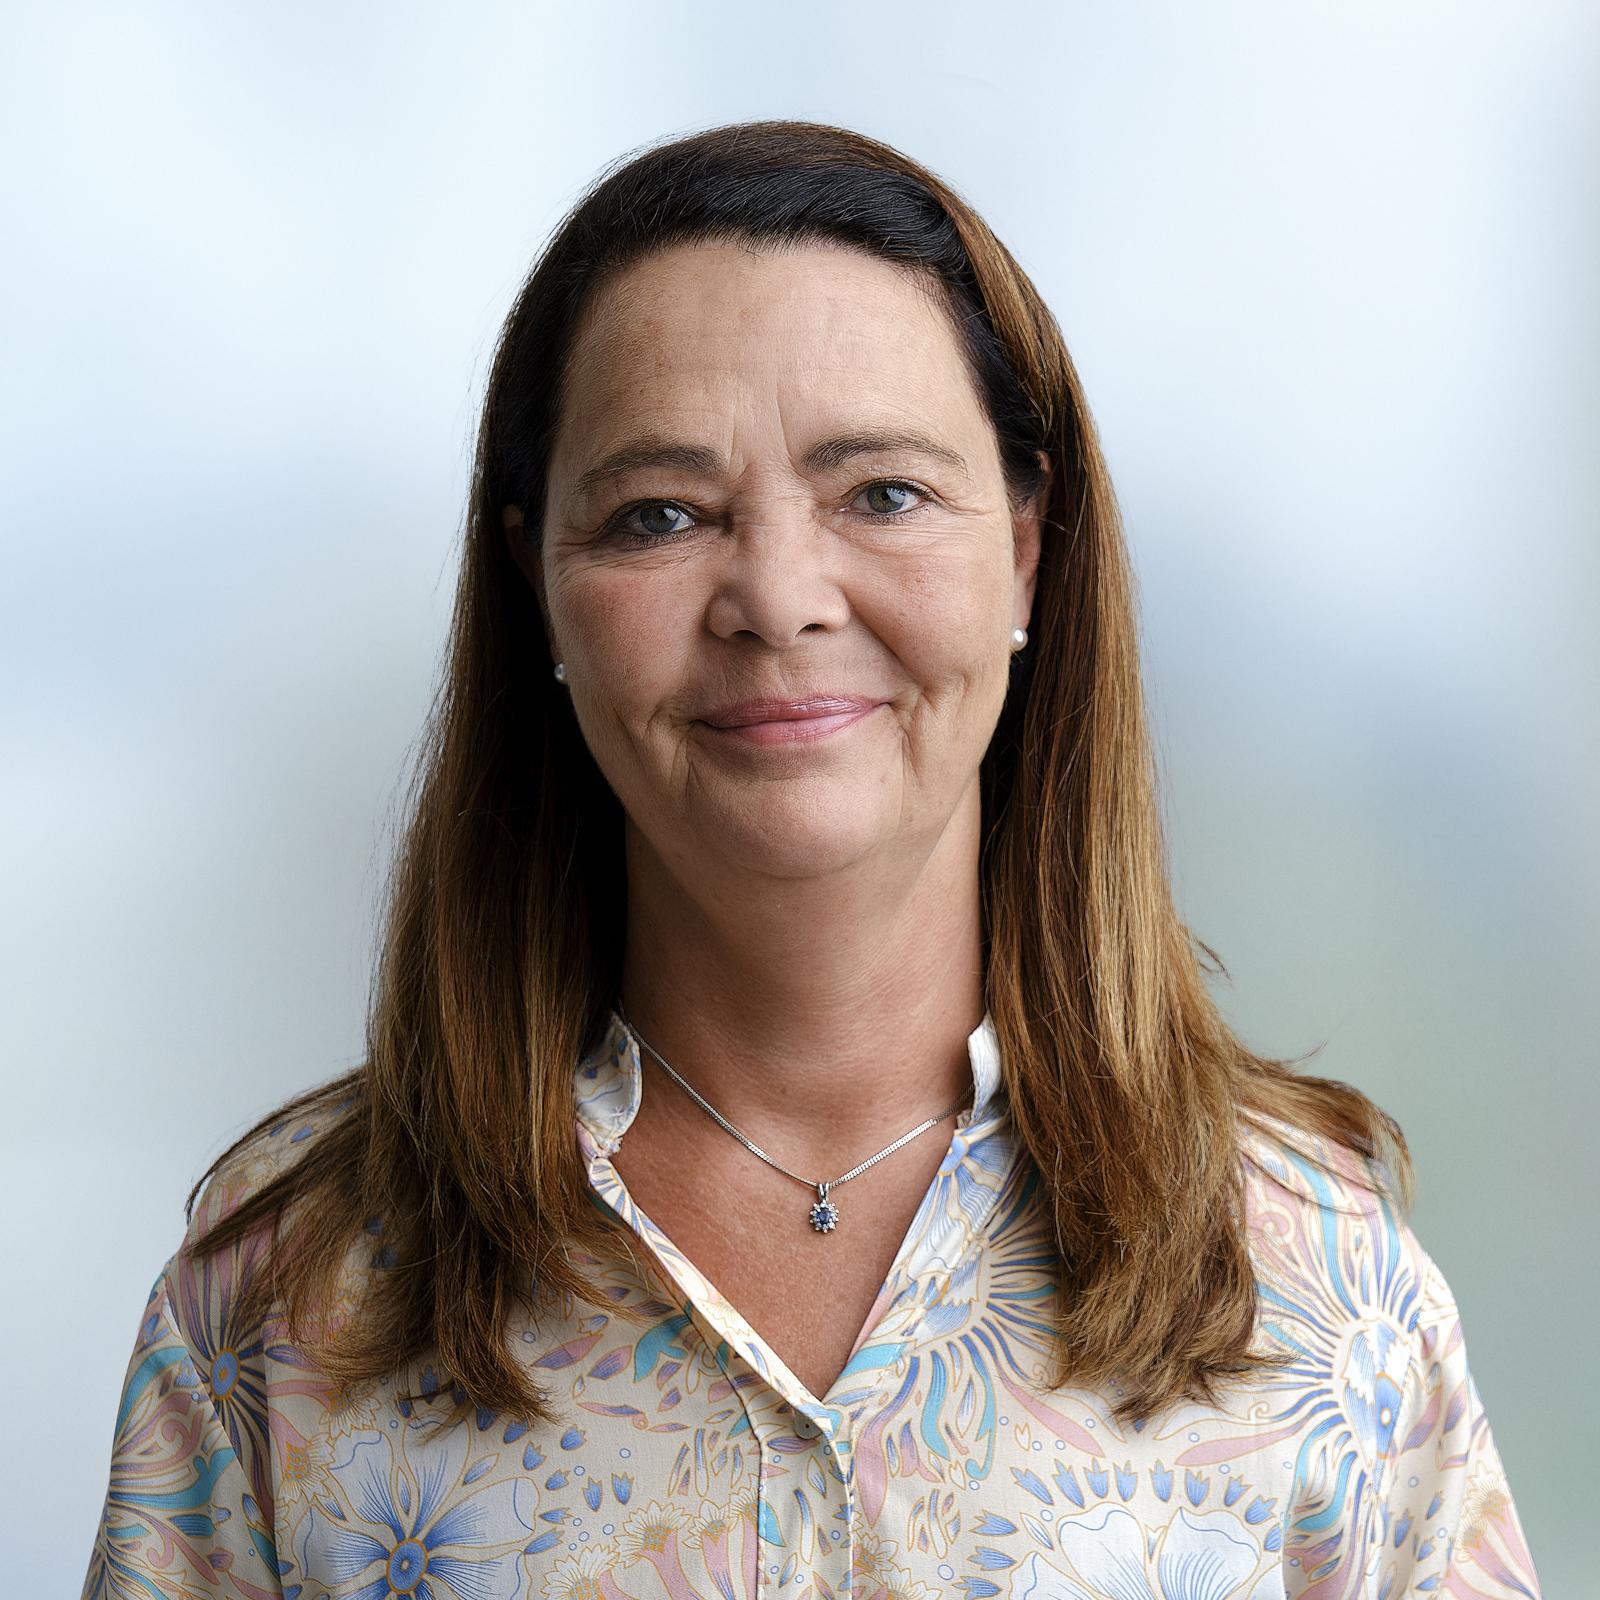 Birgitte Bregnsholm